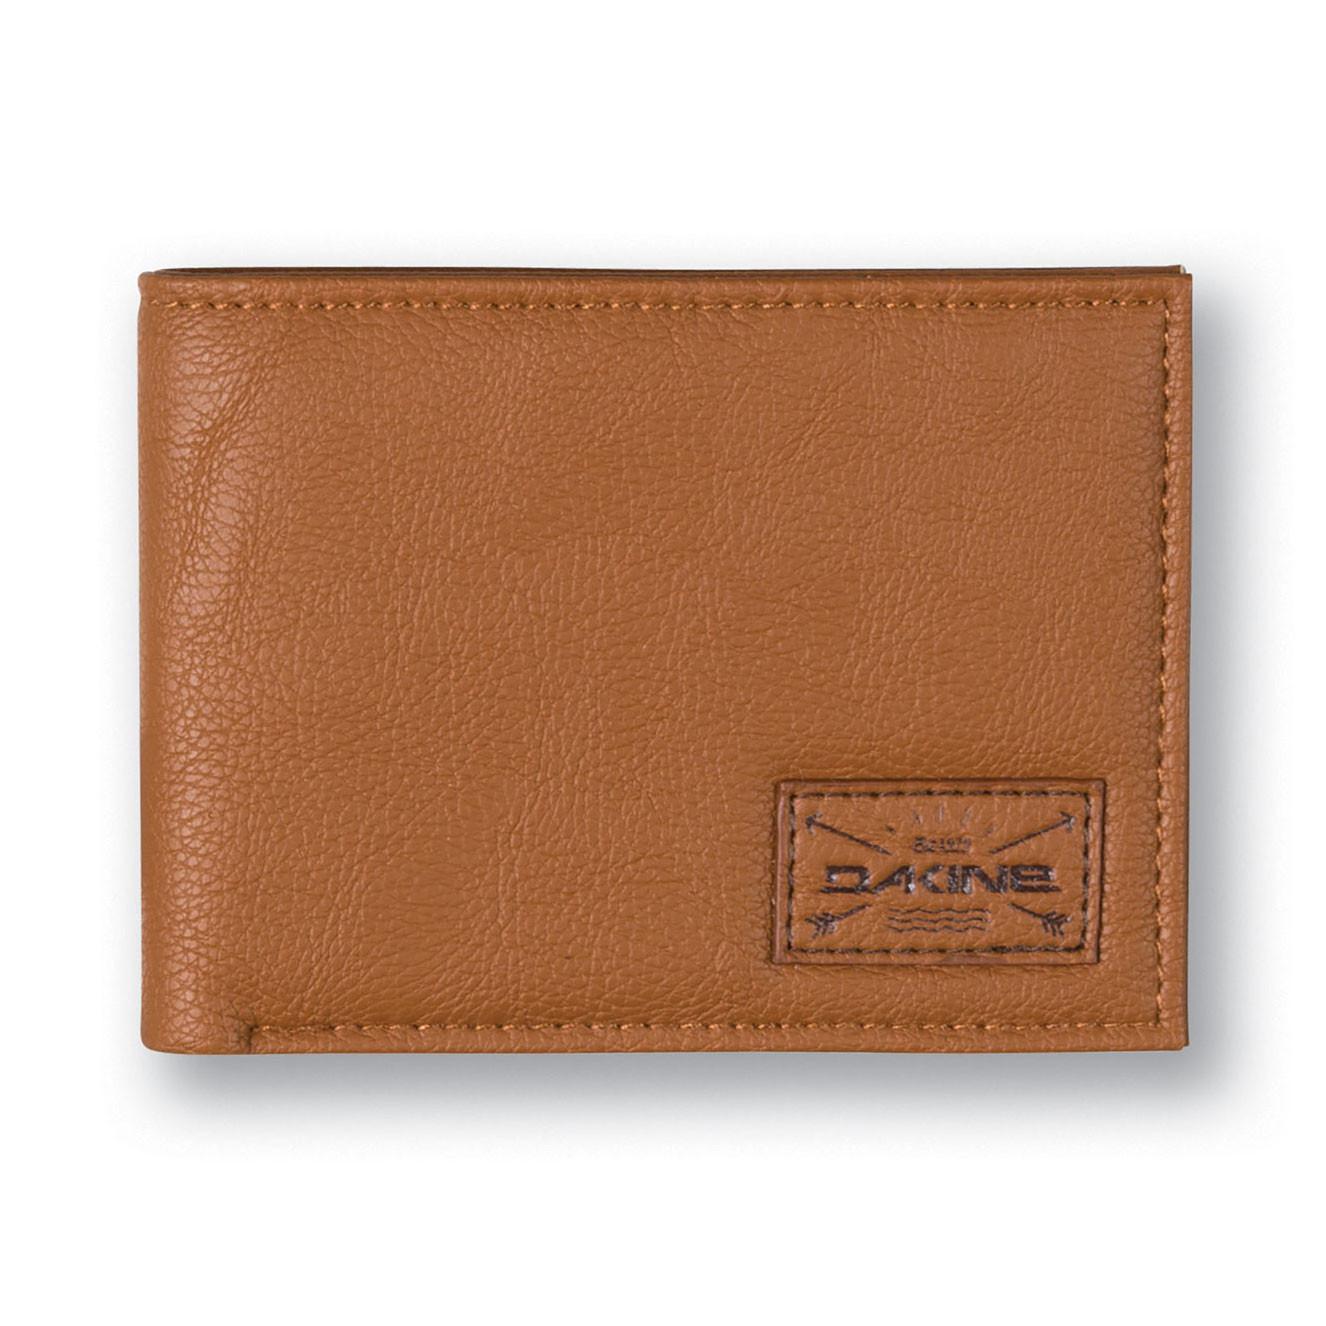 Peněženka Dakine Riggs Coin brown